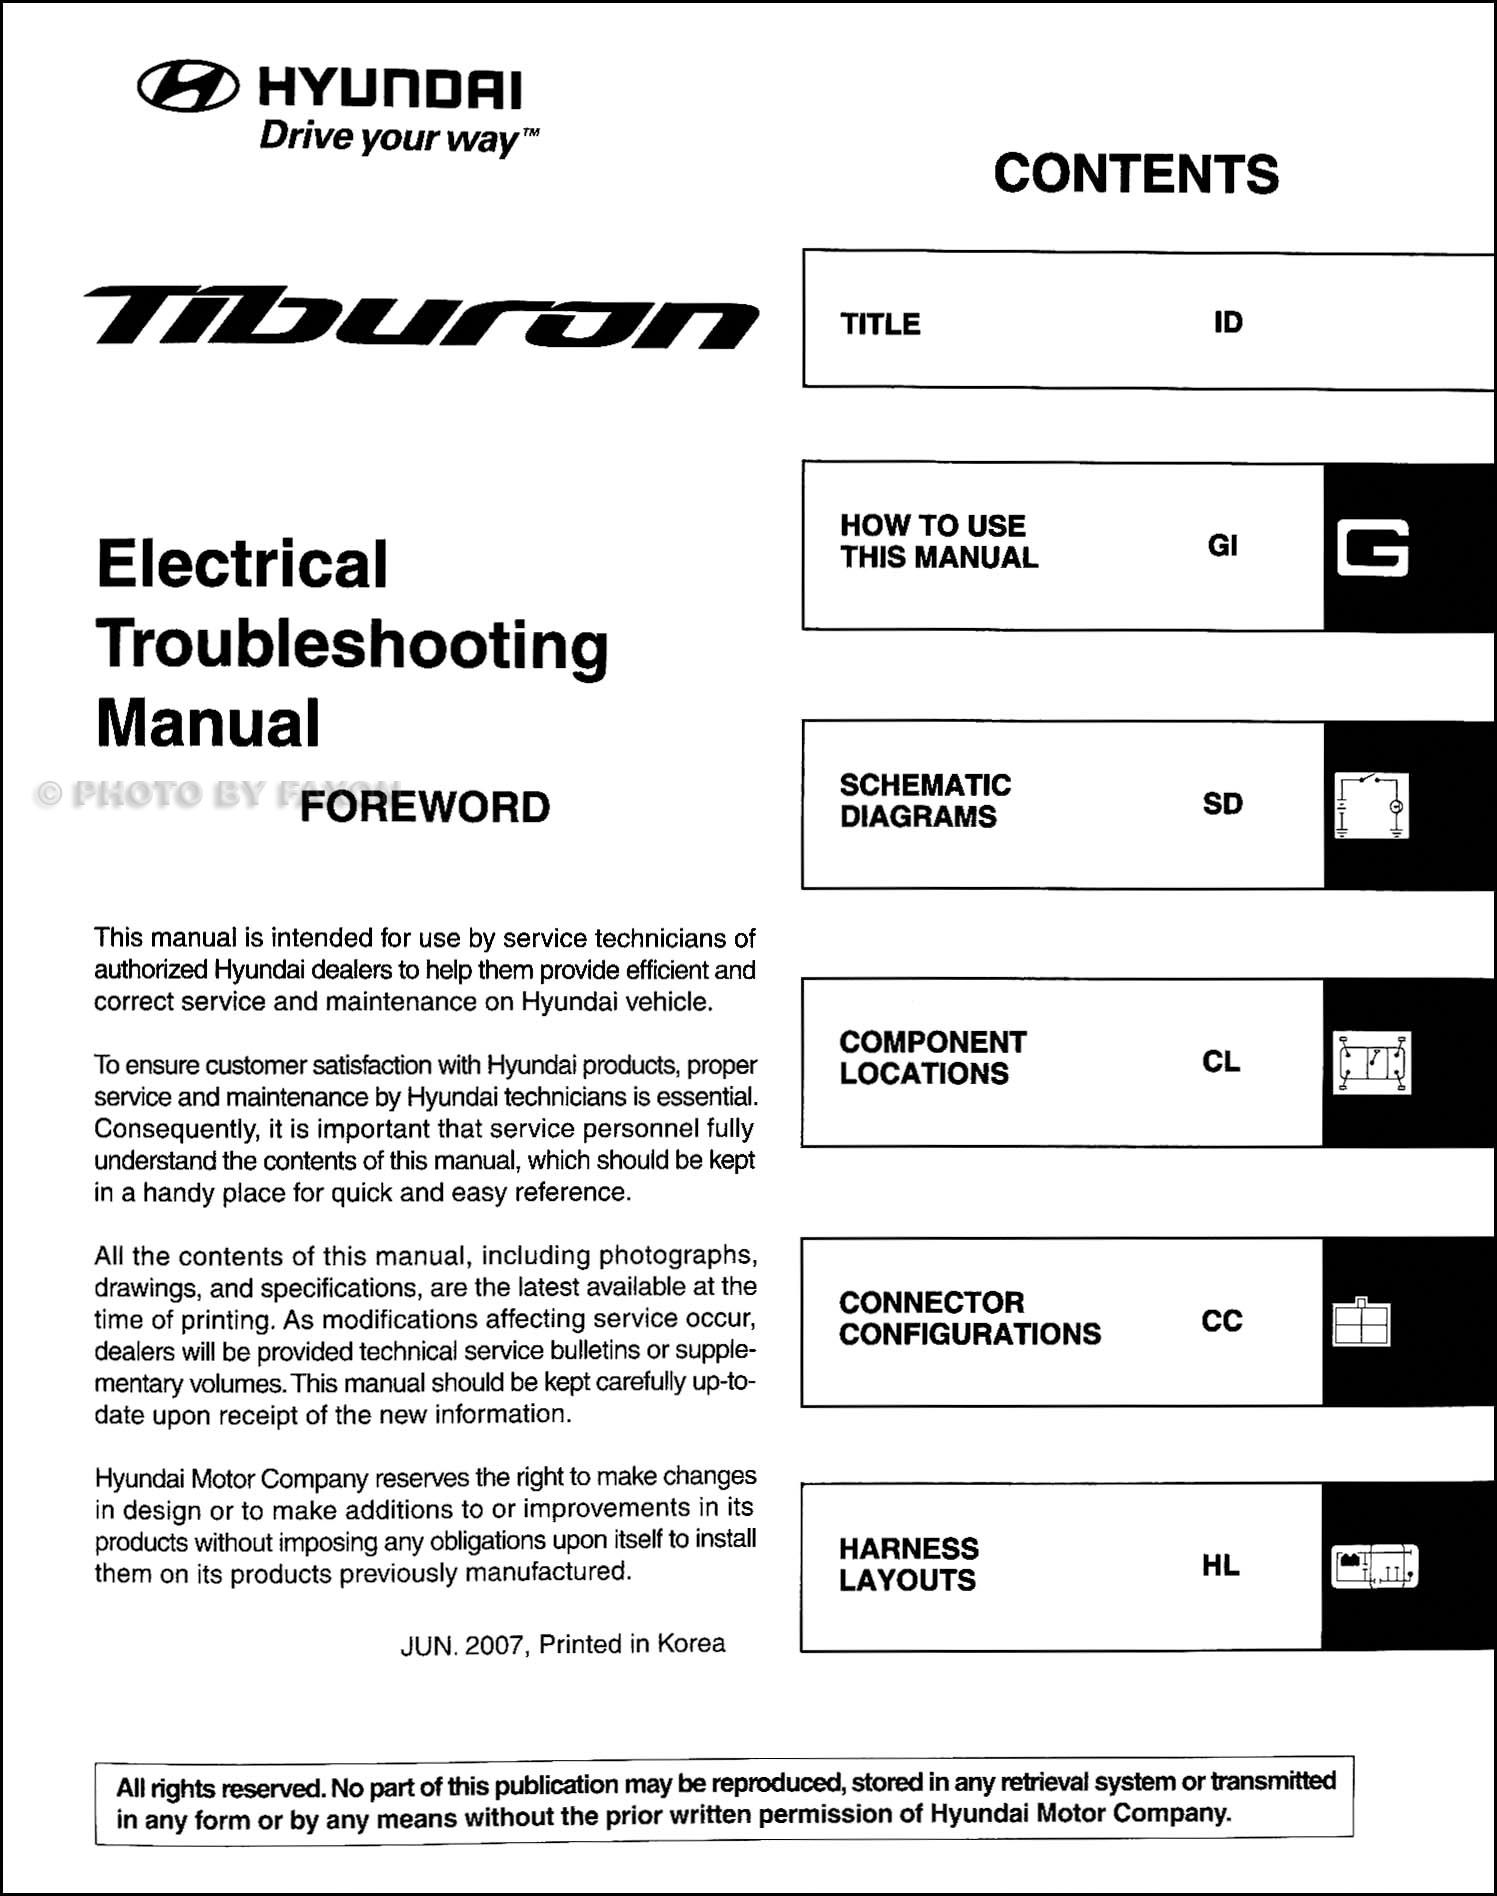 2008 hyundai tiburon electrical troubleshooting manual. Black Bedroom Furniture Sets. Home Design Ideas